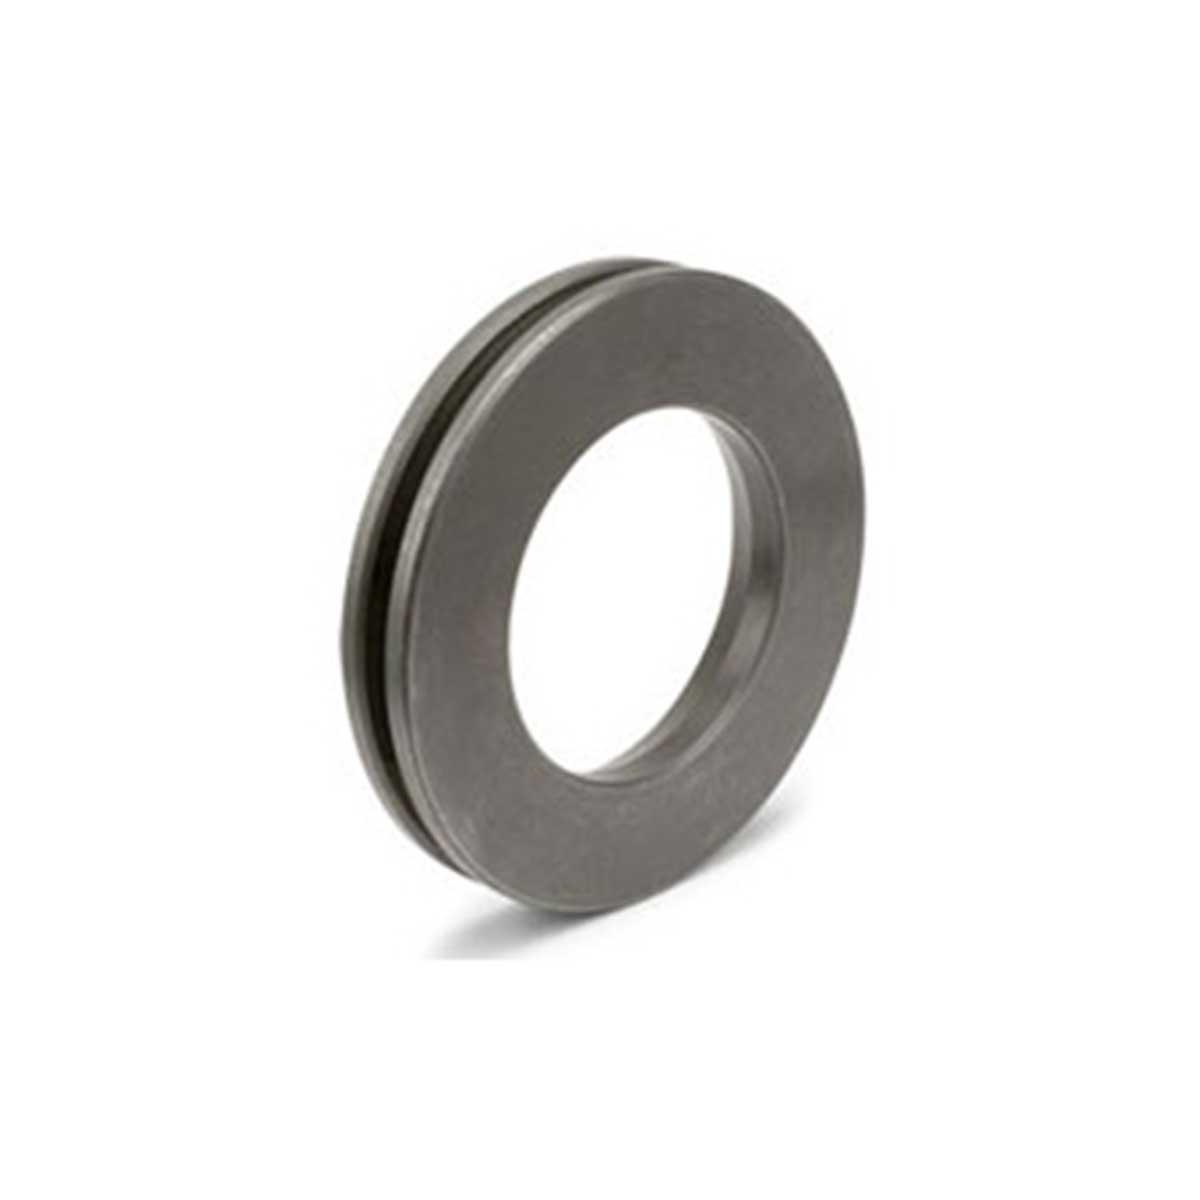 Husqvarna Drive Disk For Ring saws